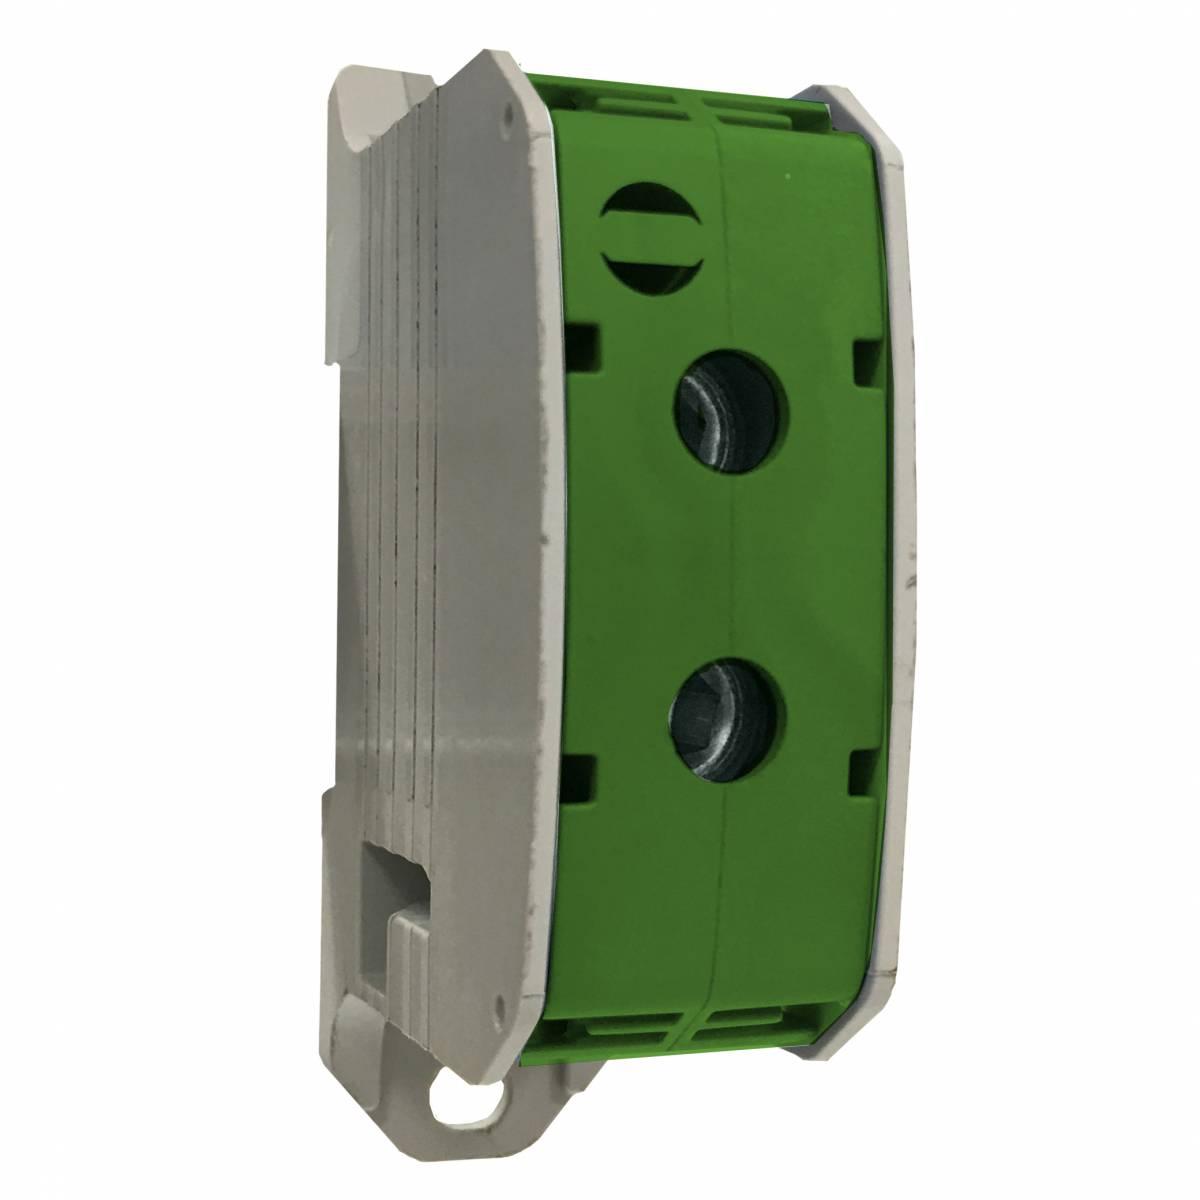 Aluminium /Copper terminal, 1 pole green, 50mm²